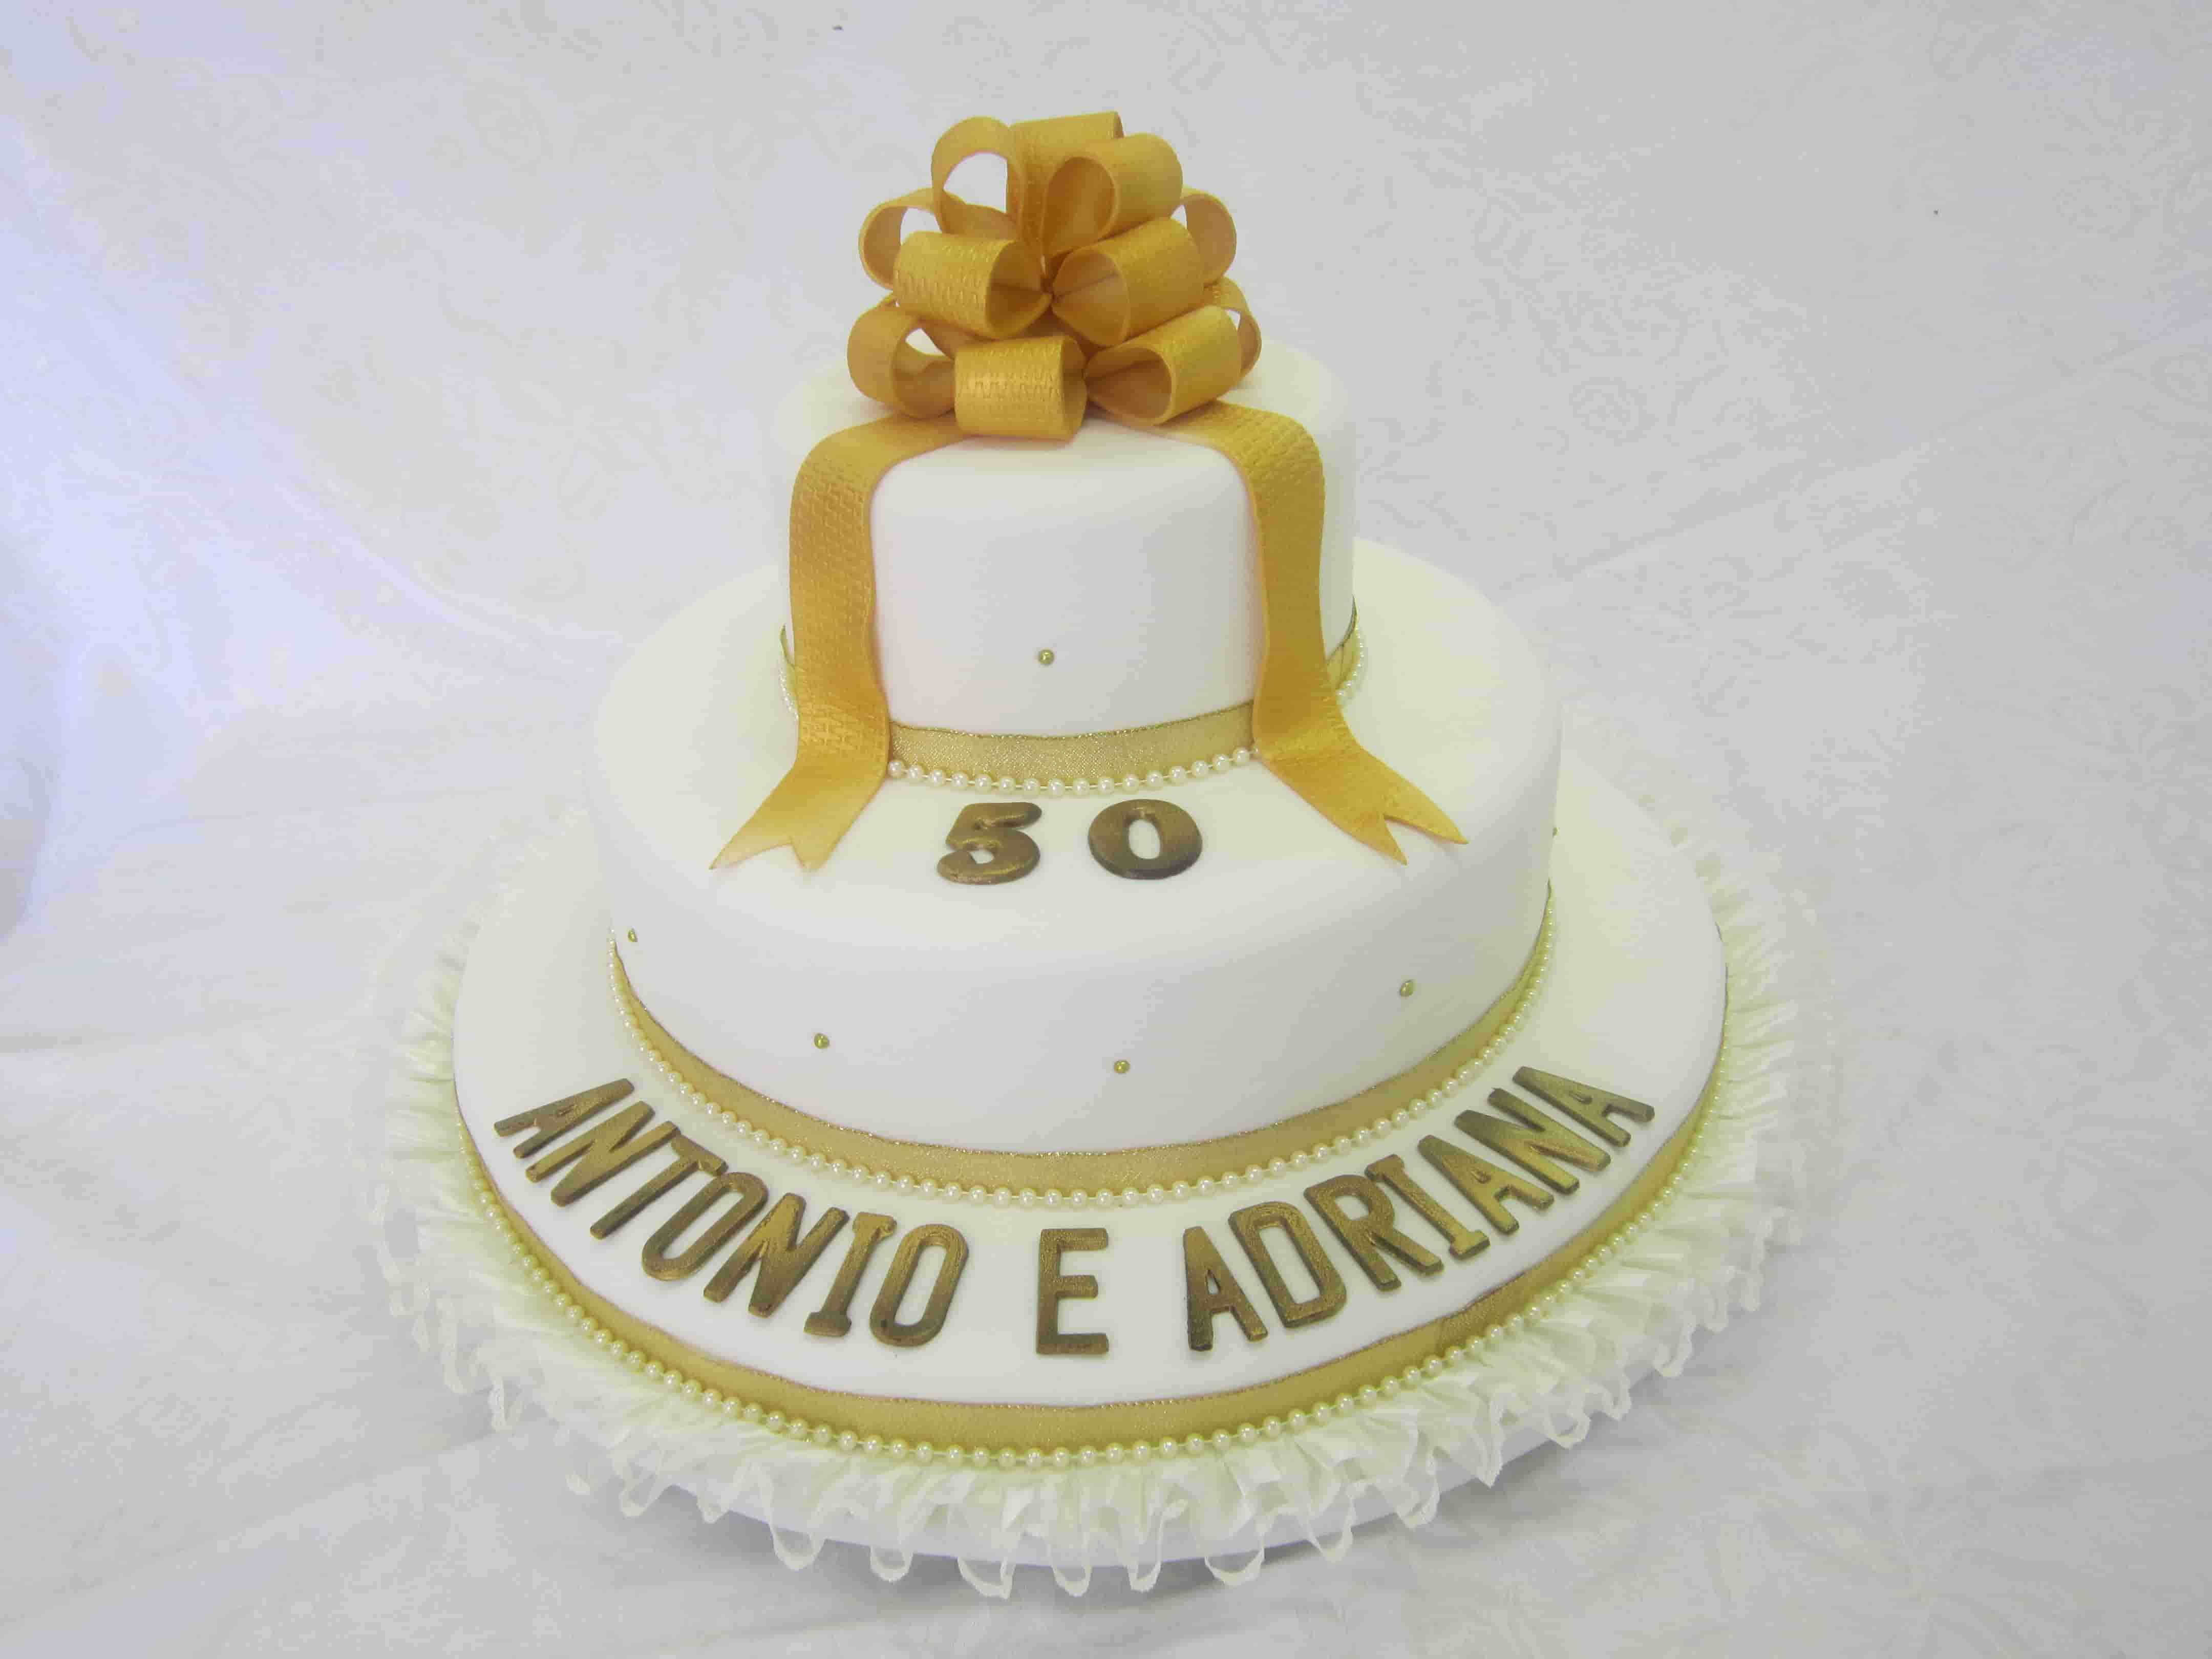 torta_anniversario_1-min-min